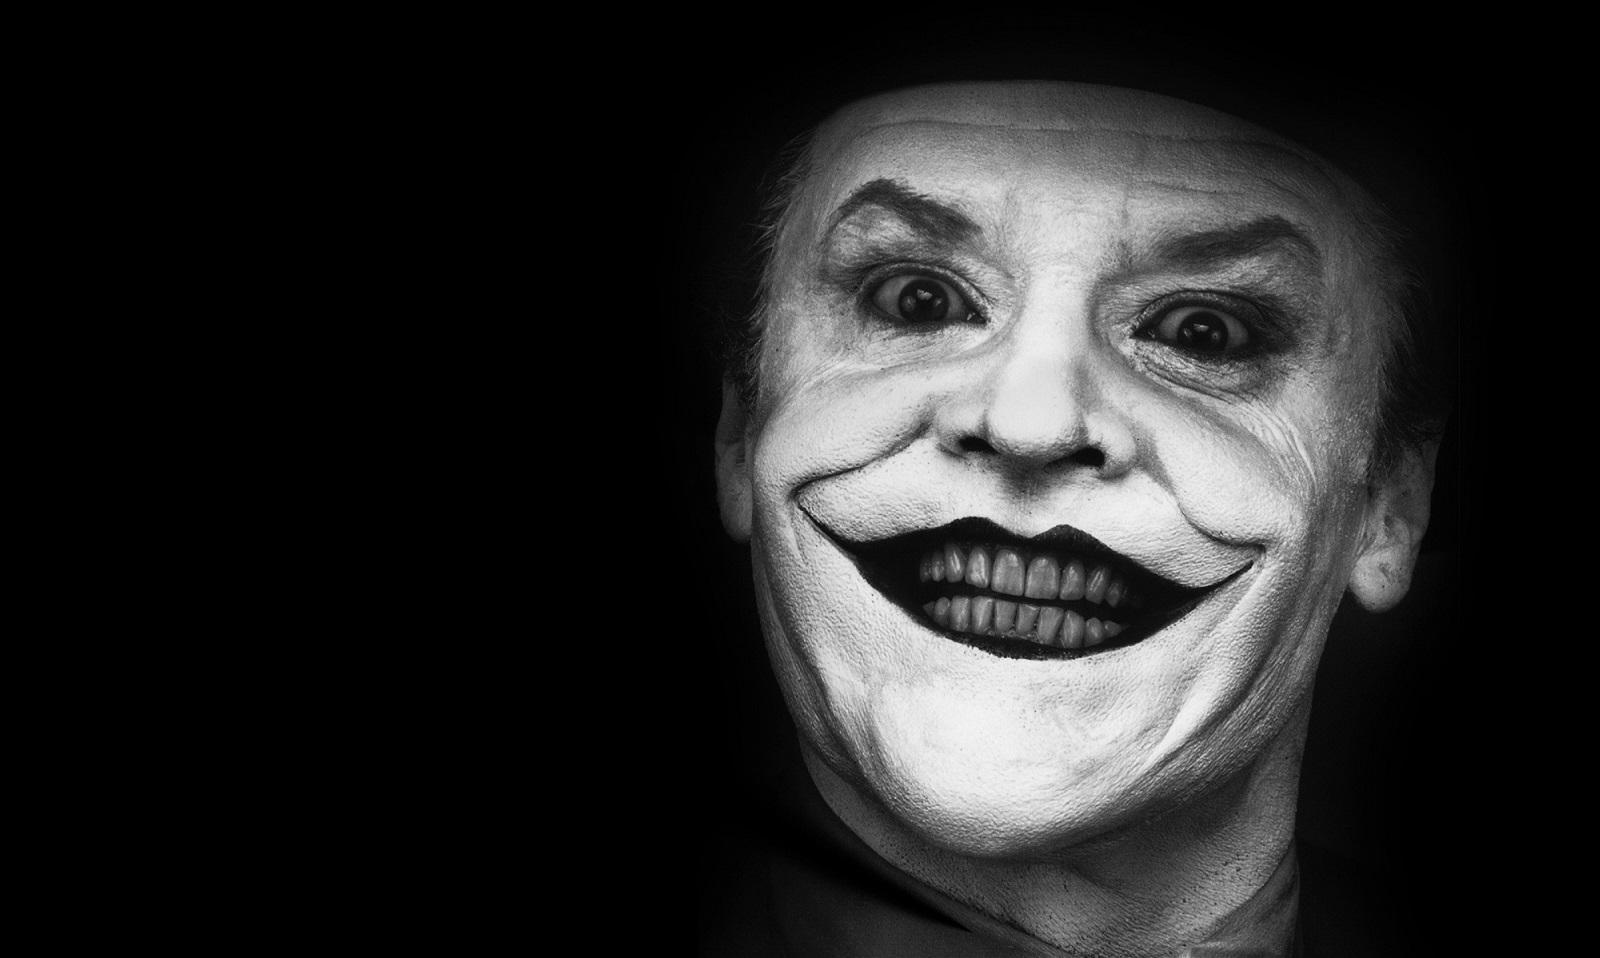 Joker Nicholson 0